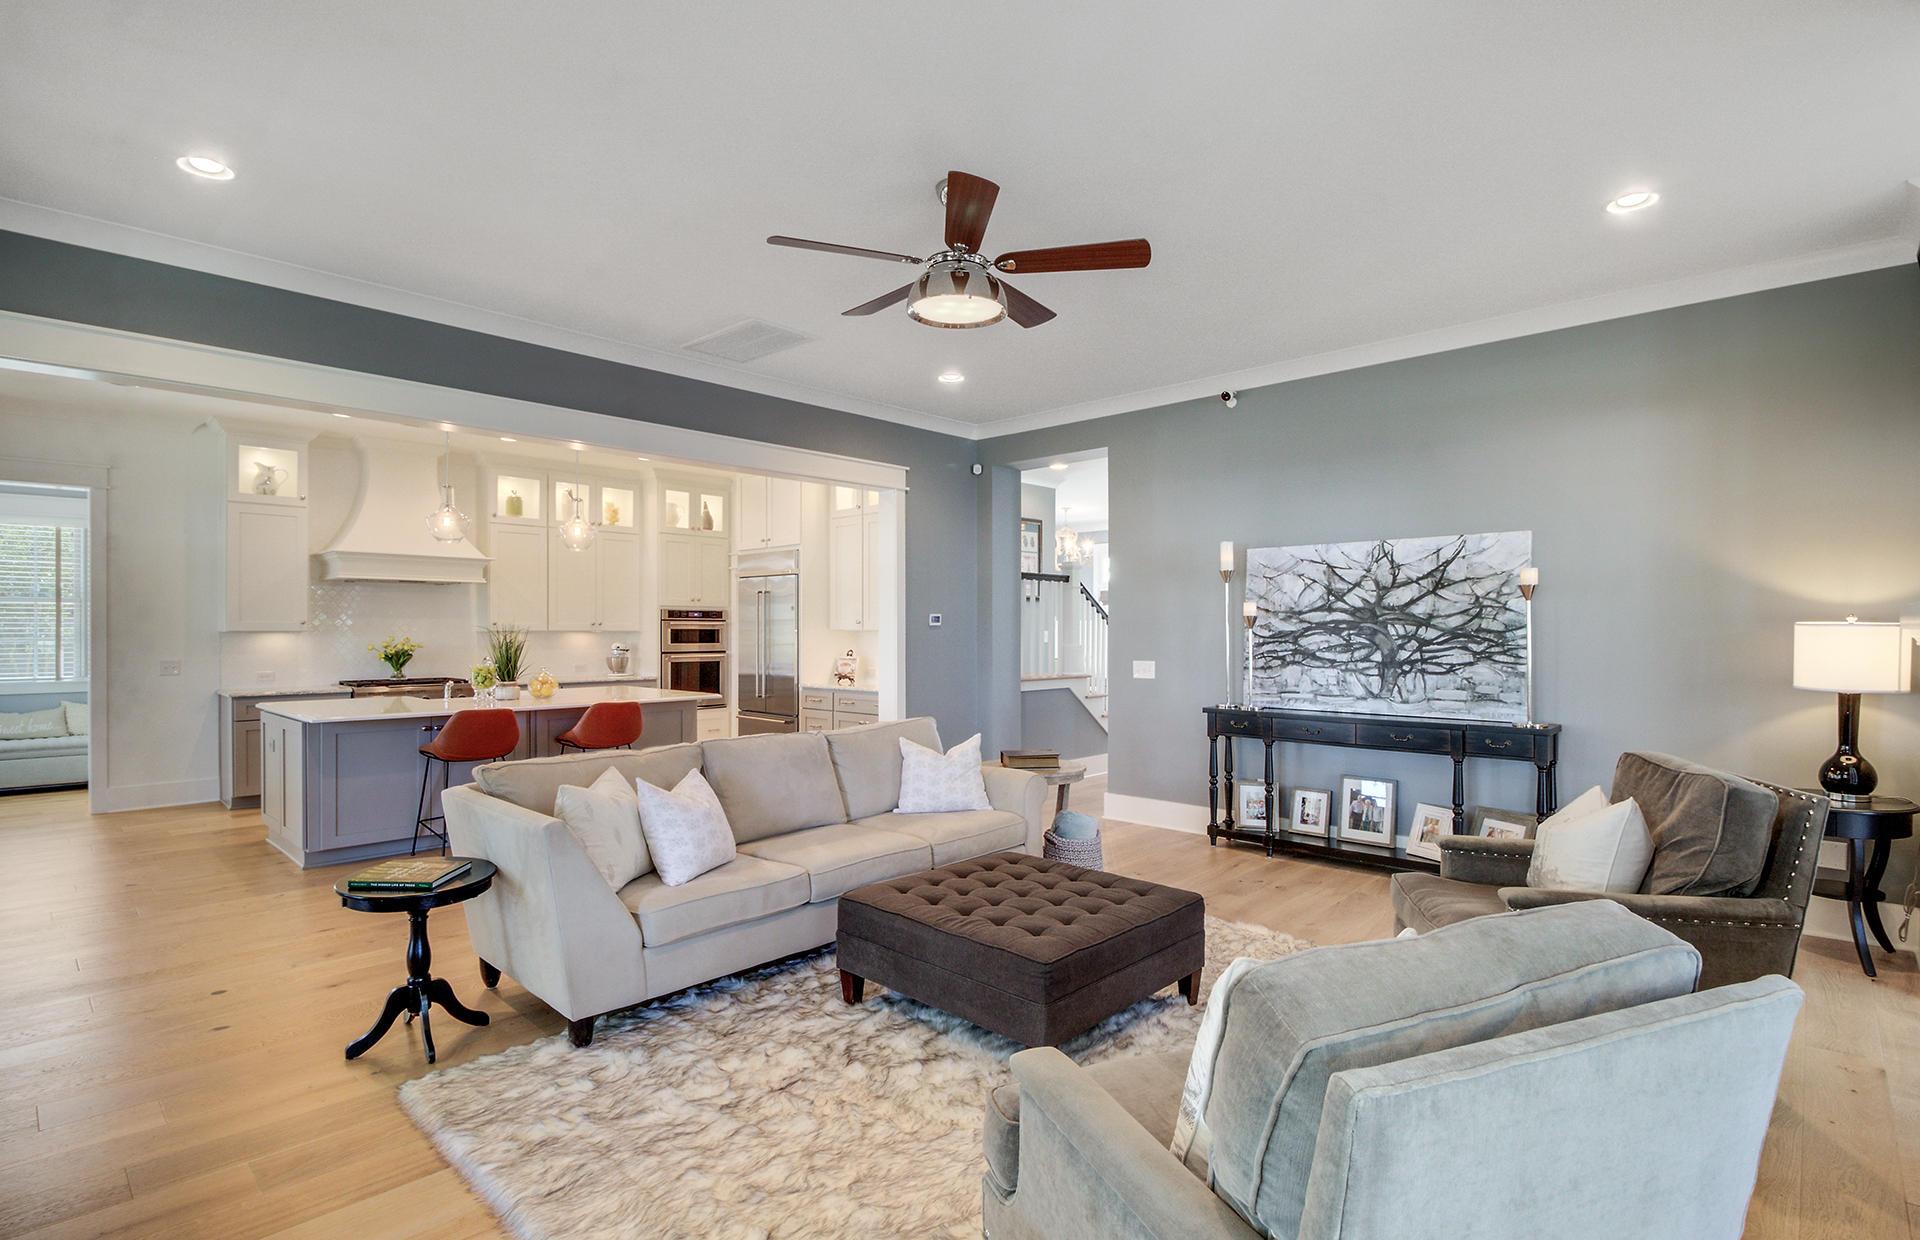 Daniel Island Homes For Sale - 135 Brailsford, Charleston, SC - 3